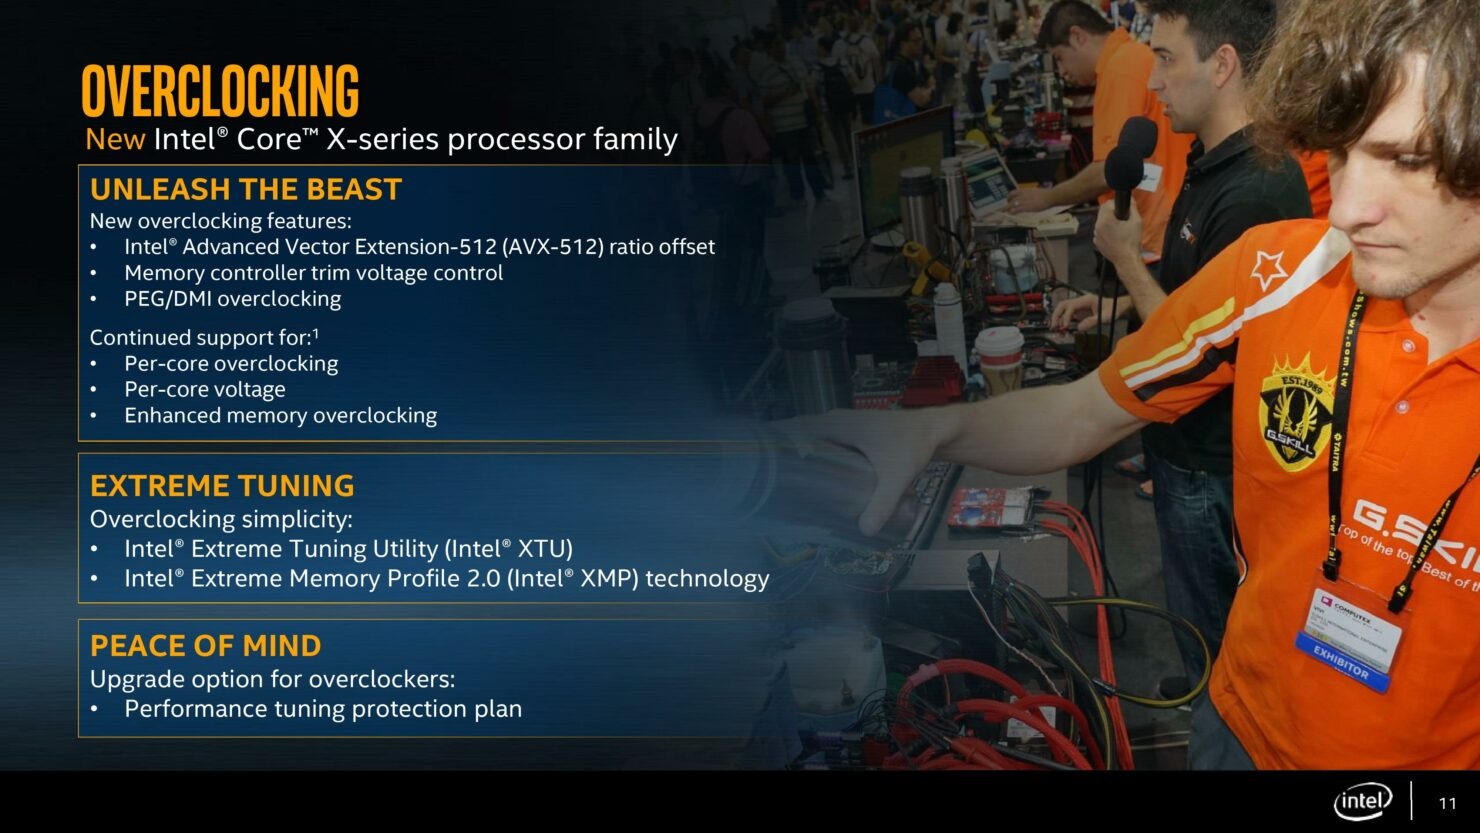 intel-core-x-cpu-skylake-x-and-kaby-lake-x-x299-hedt-platform-launch_overclocking